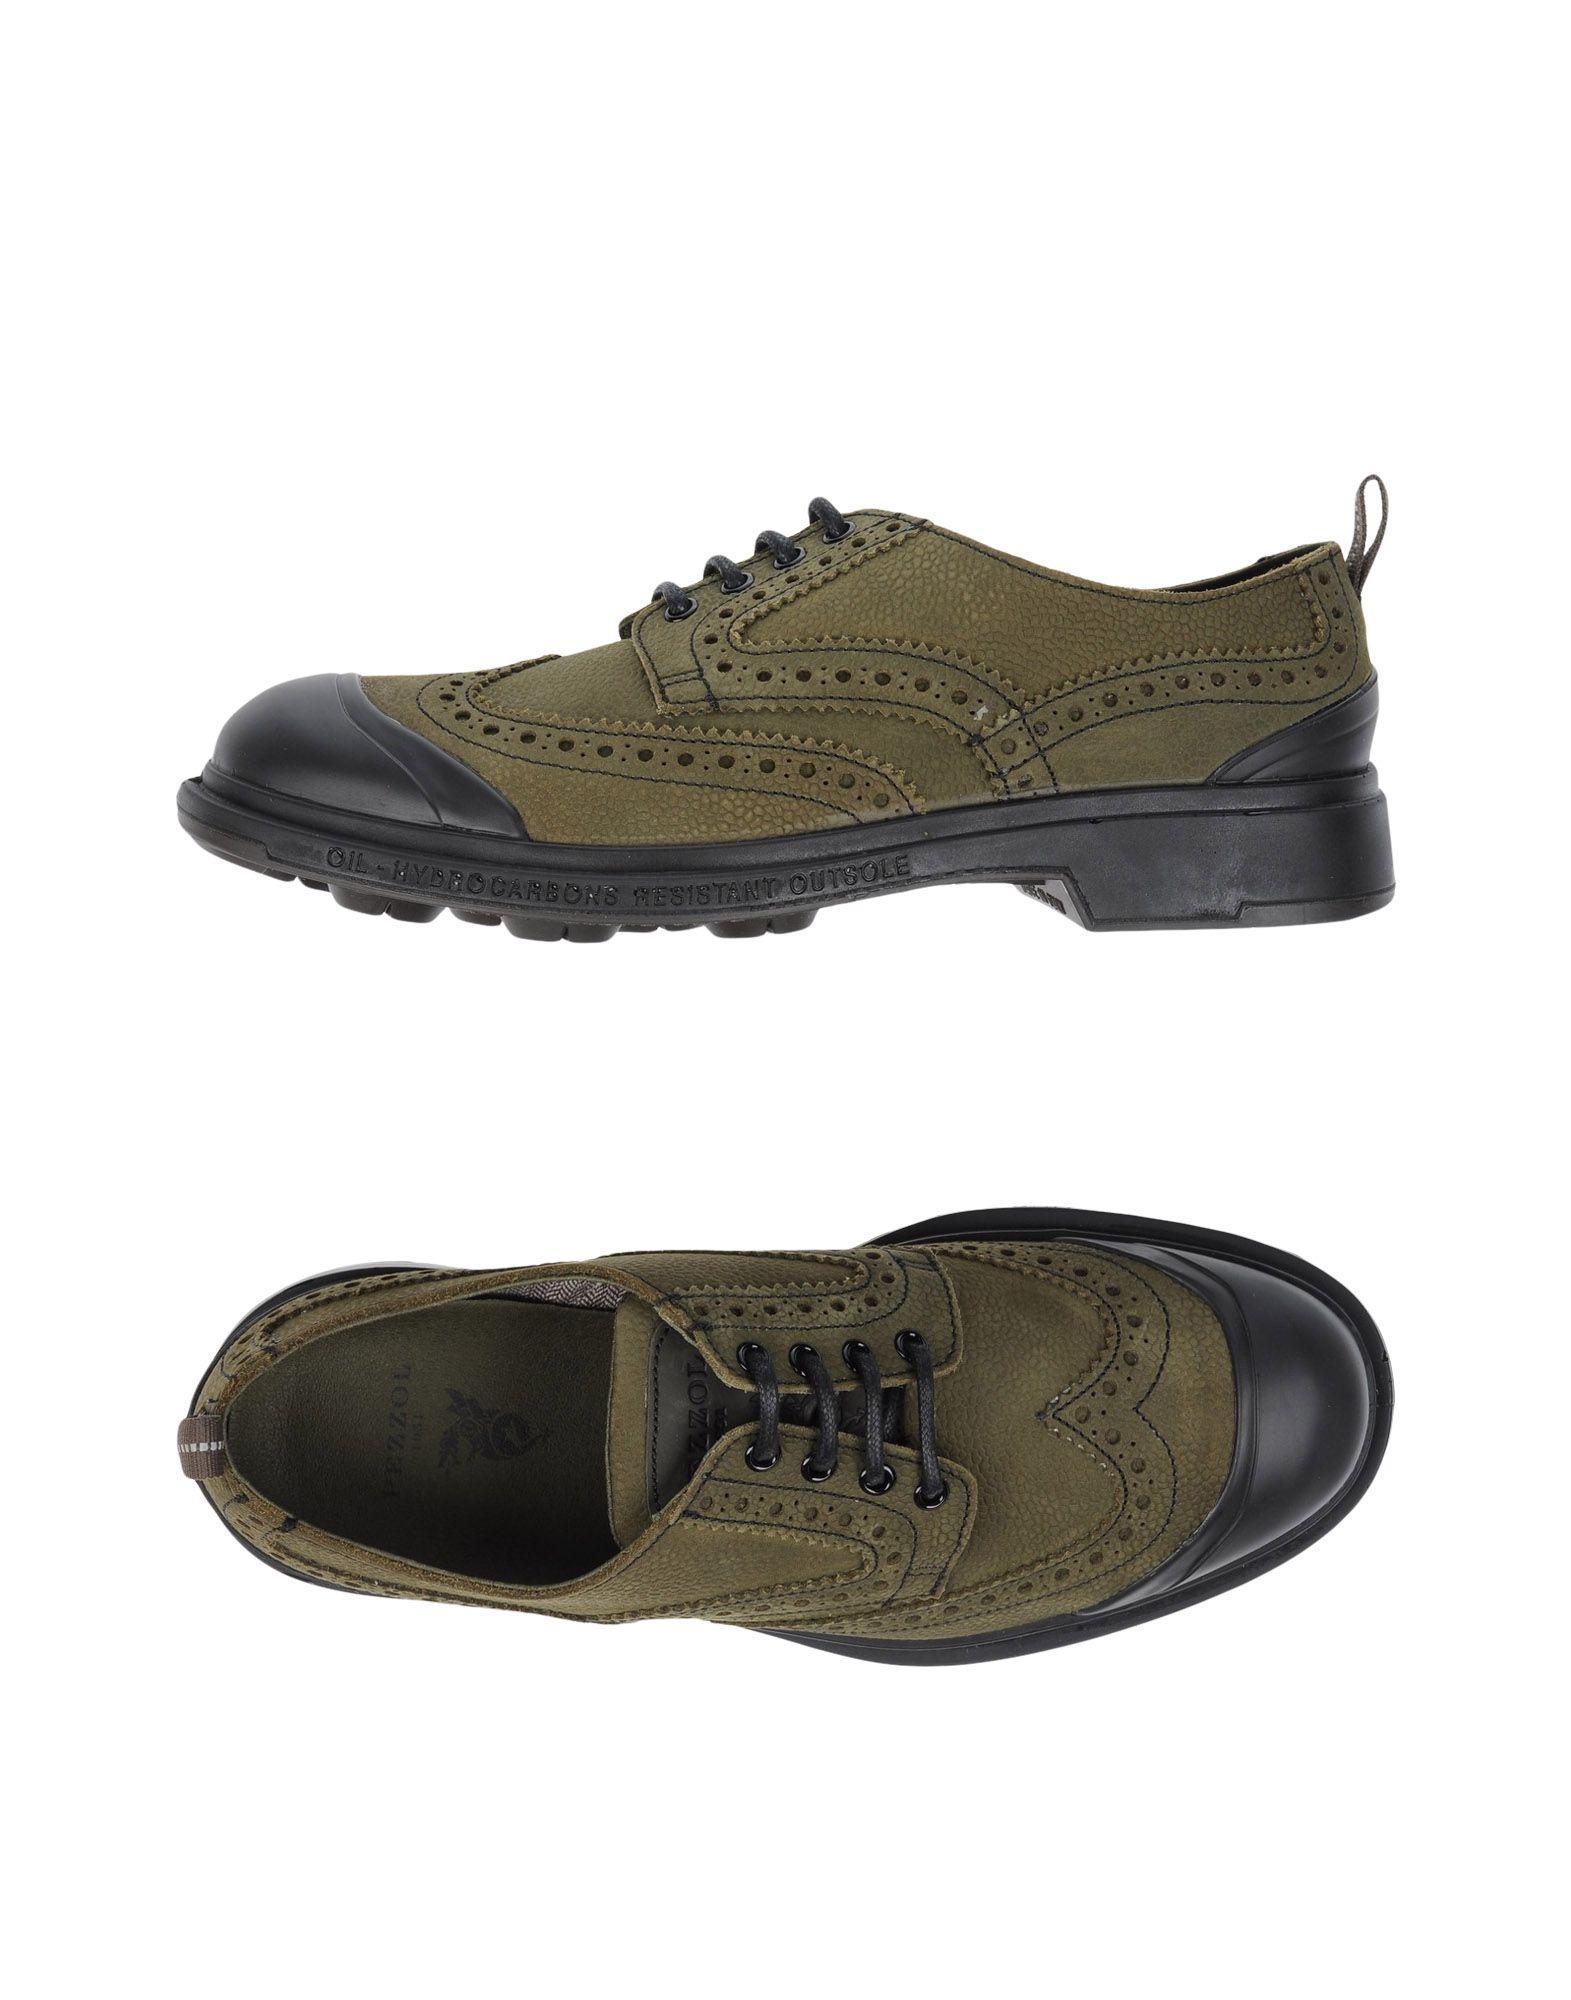 Rabatt 1951 echte Schuhe Pezzol  1951 Rabatt Schnürschuhe Herren  11239947SG f142a5